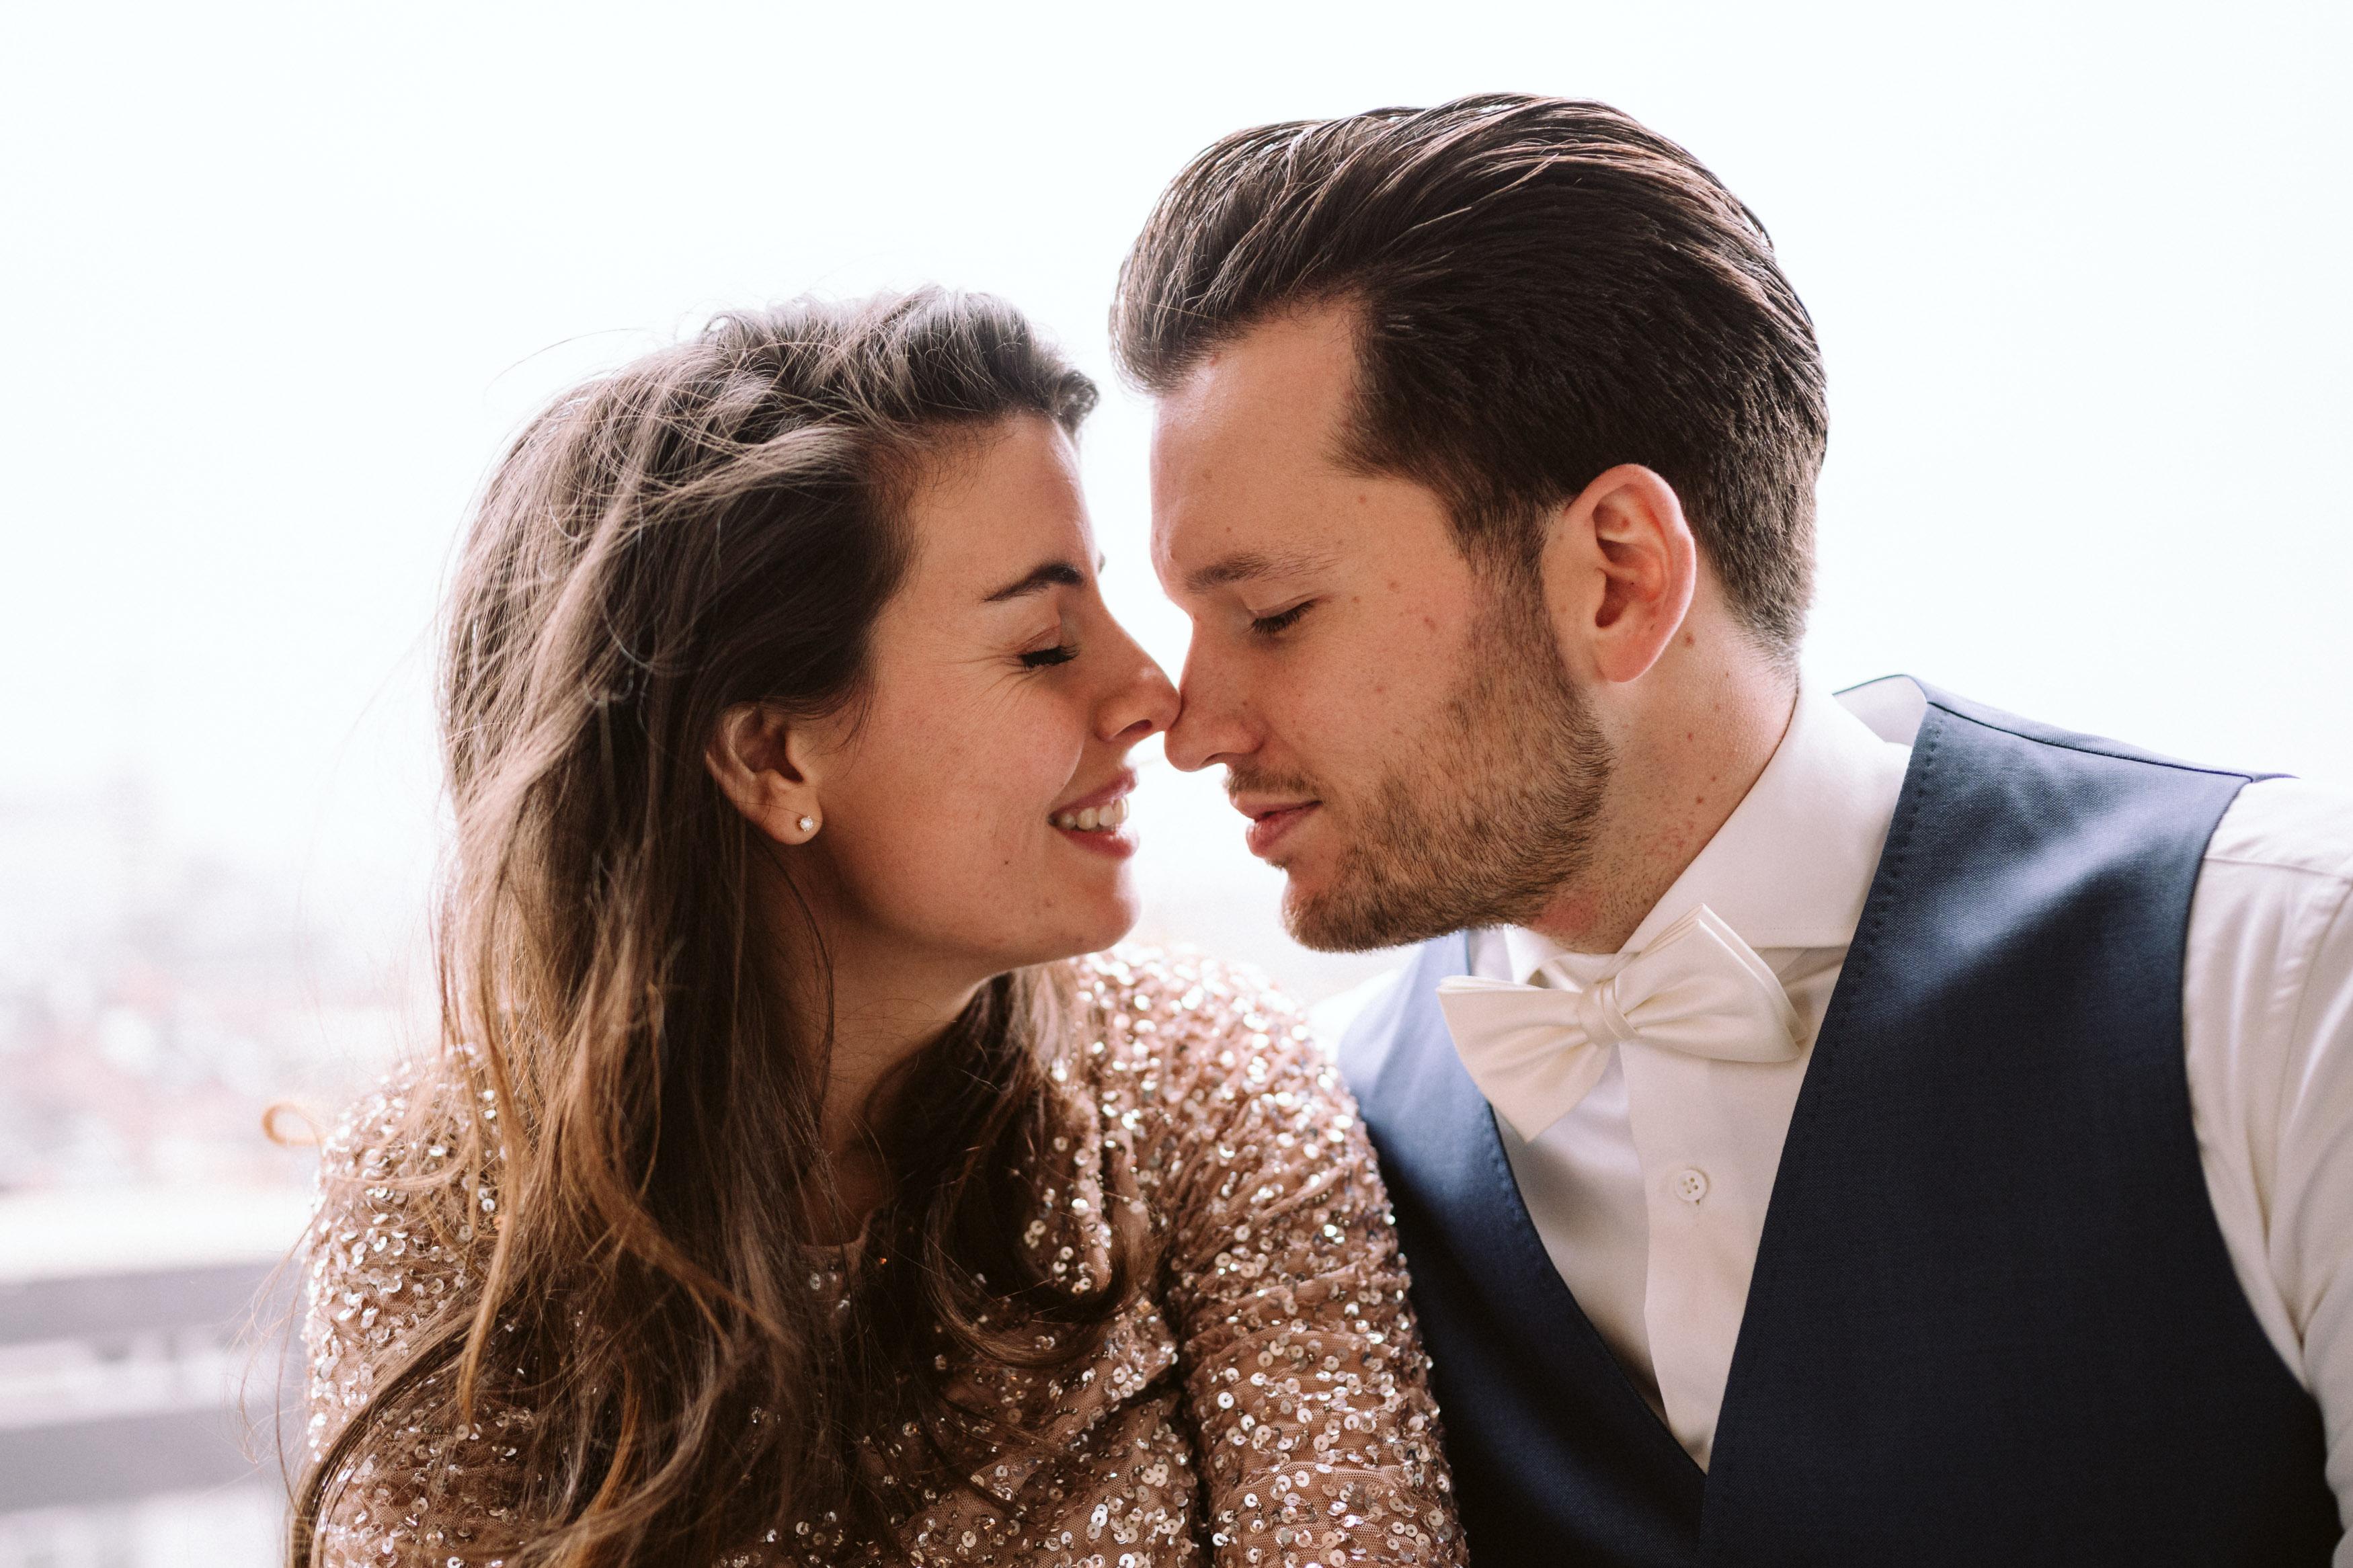 romoantic couple close-up